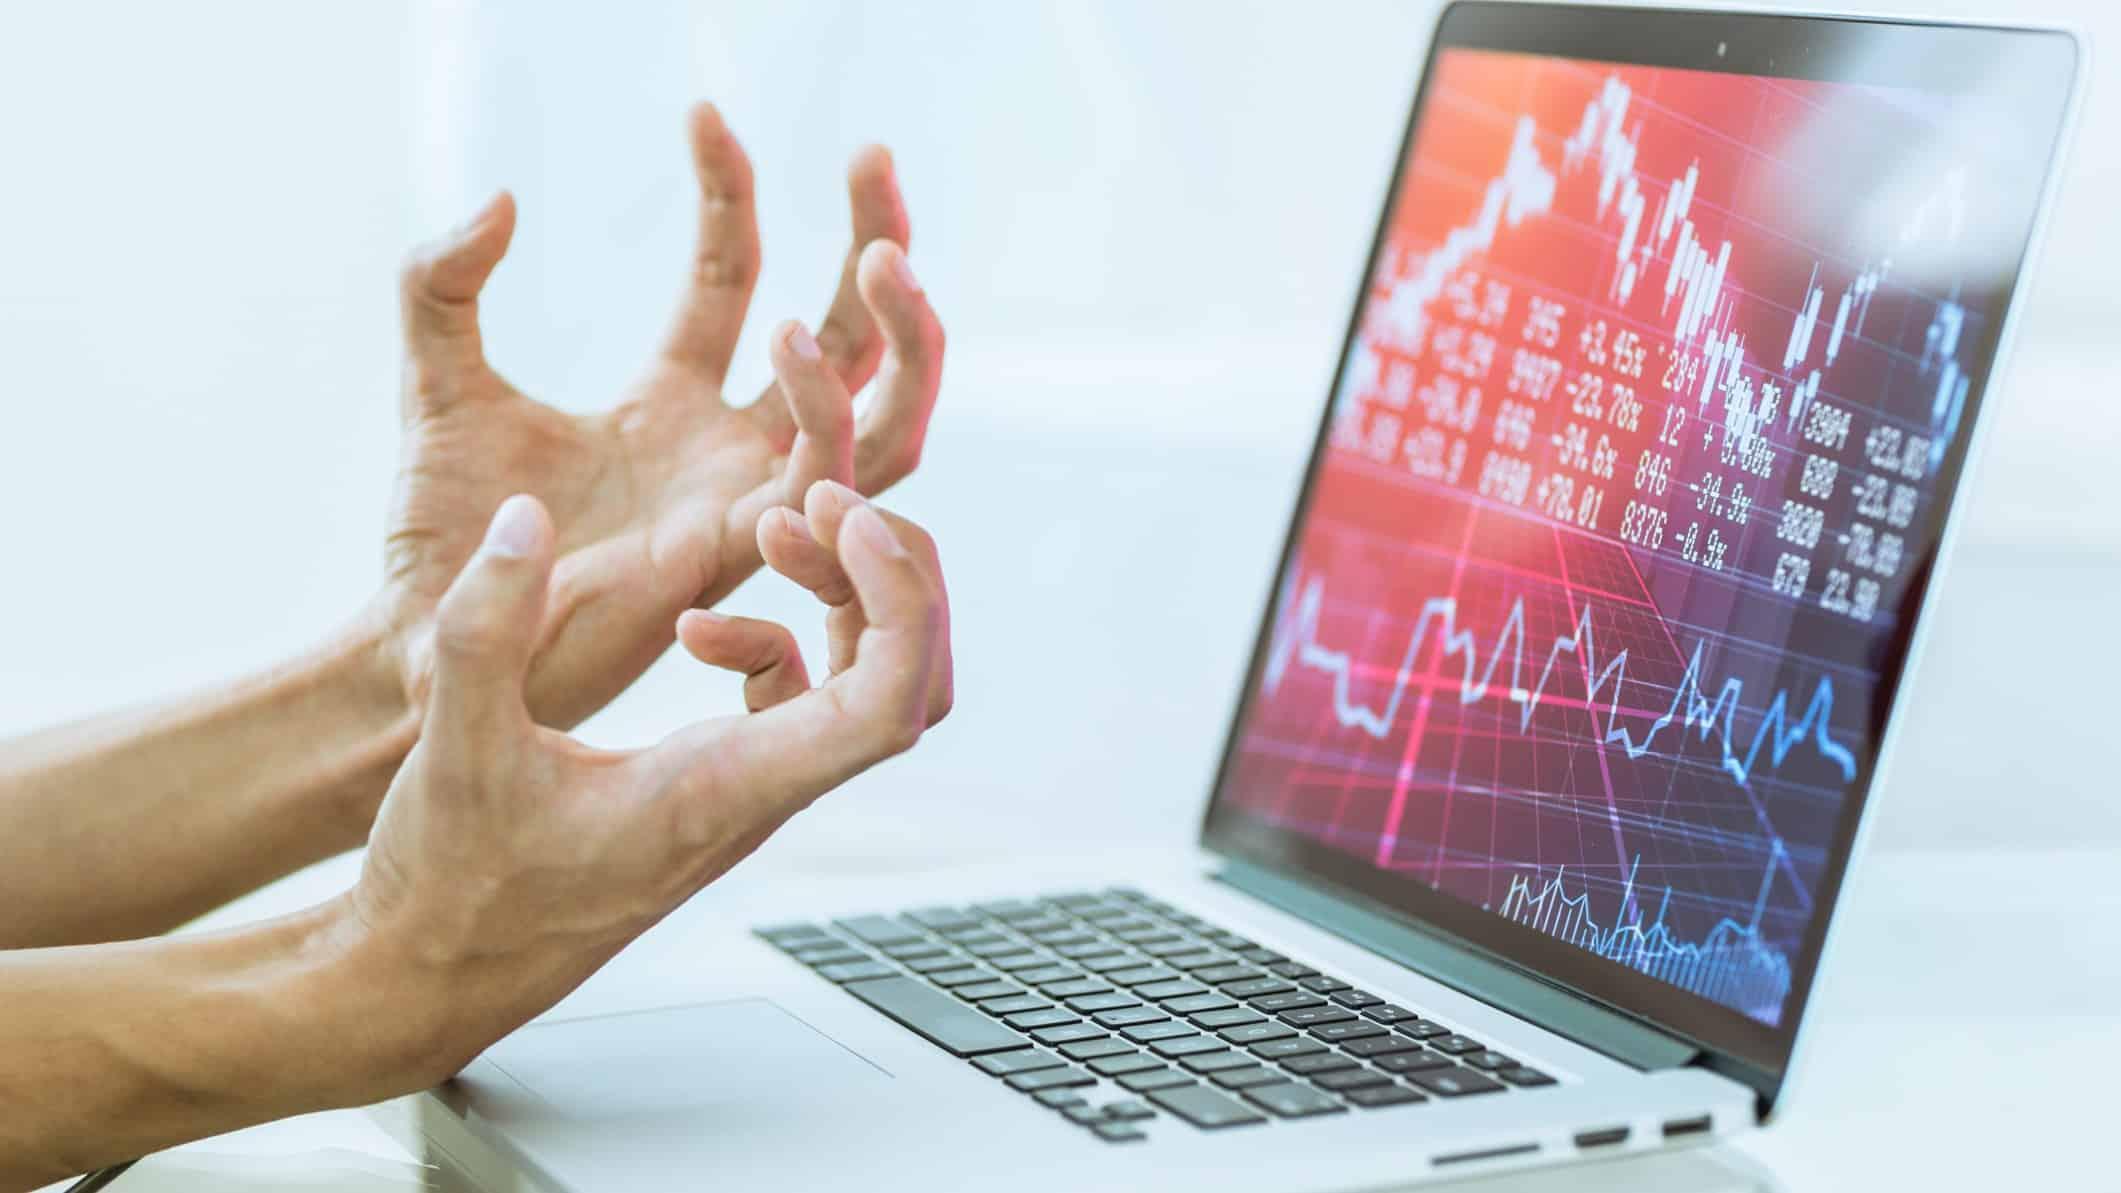 hands making frustrated gesture at computer screen depicting stock market crash charts